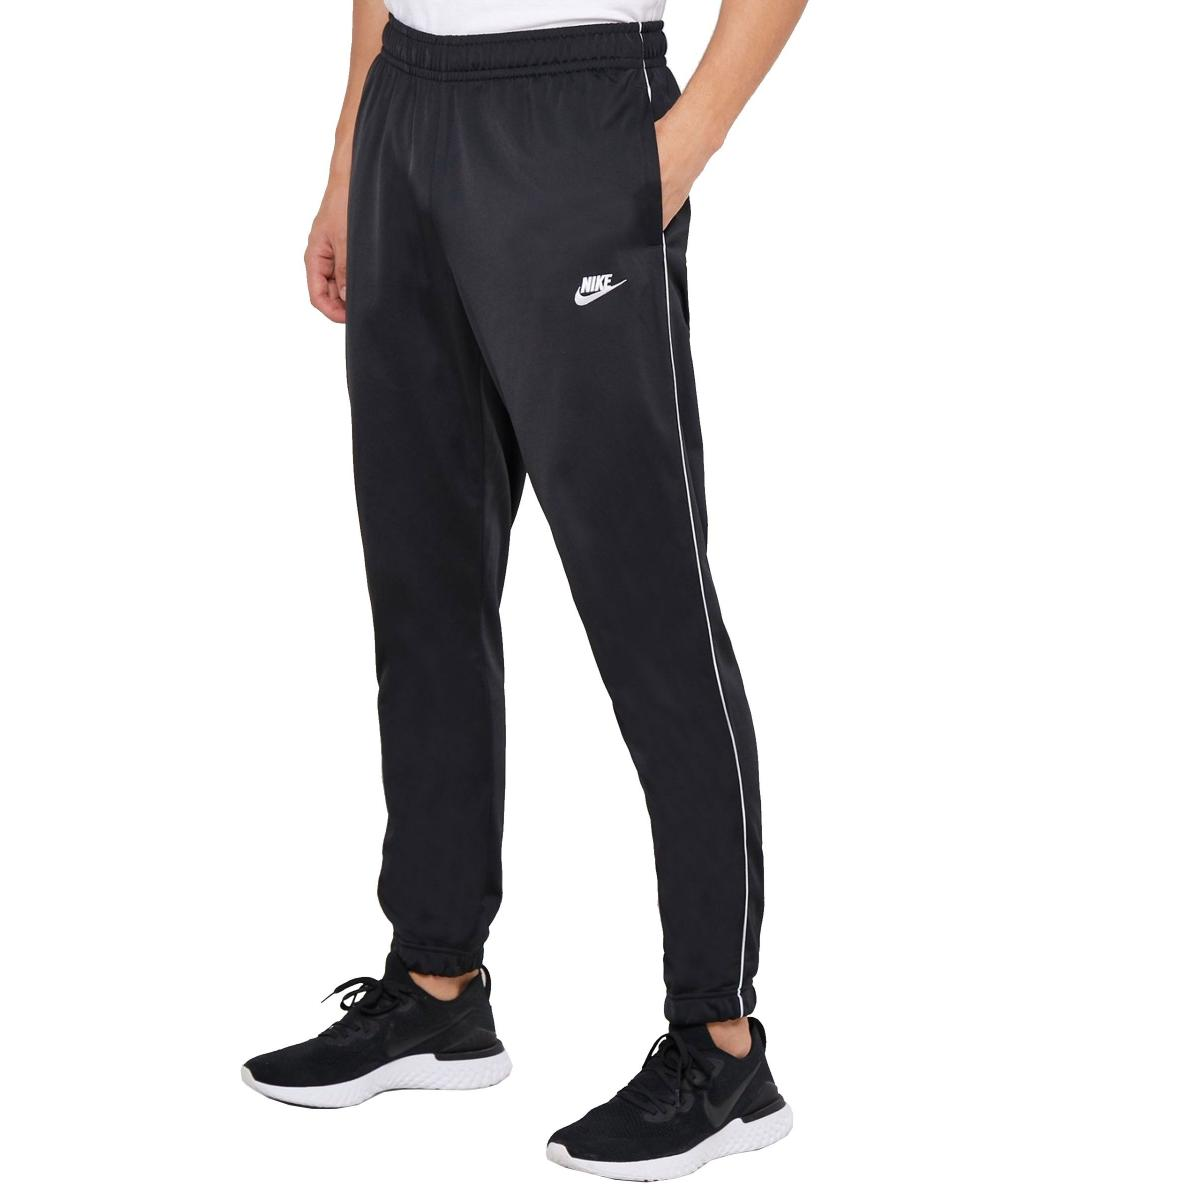 Tuta sportiva Nike TRK basic felpa e pantaloni da uomo rif. BV3034